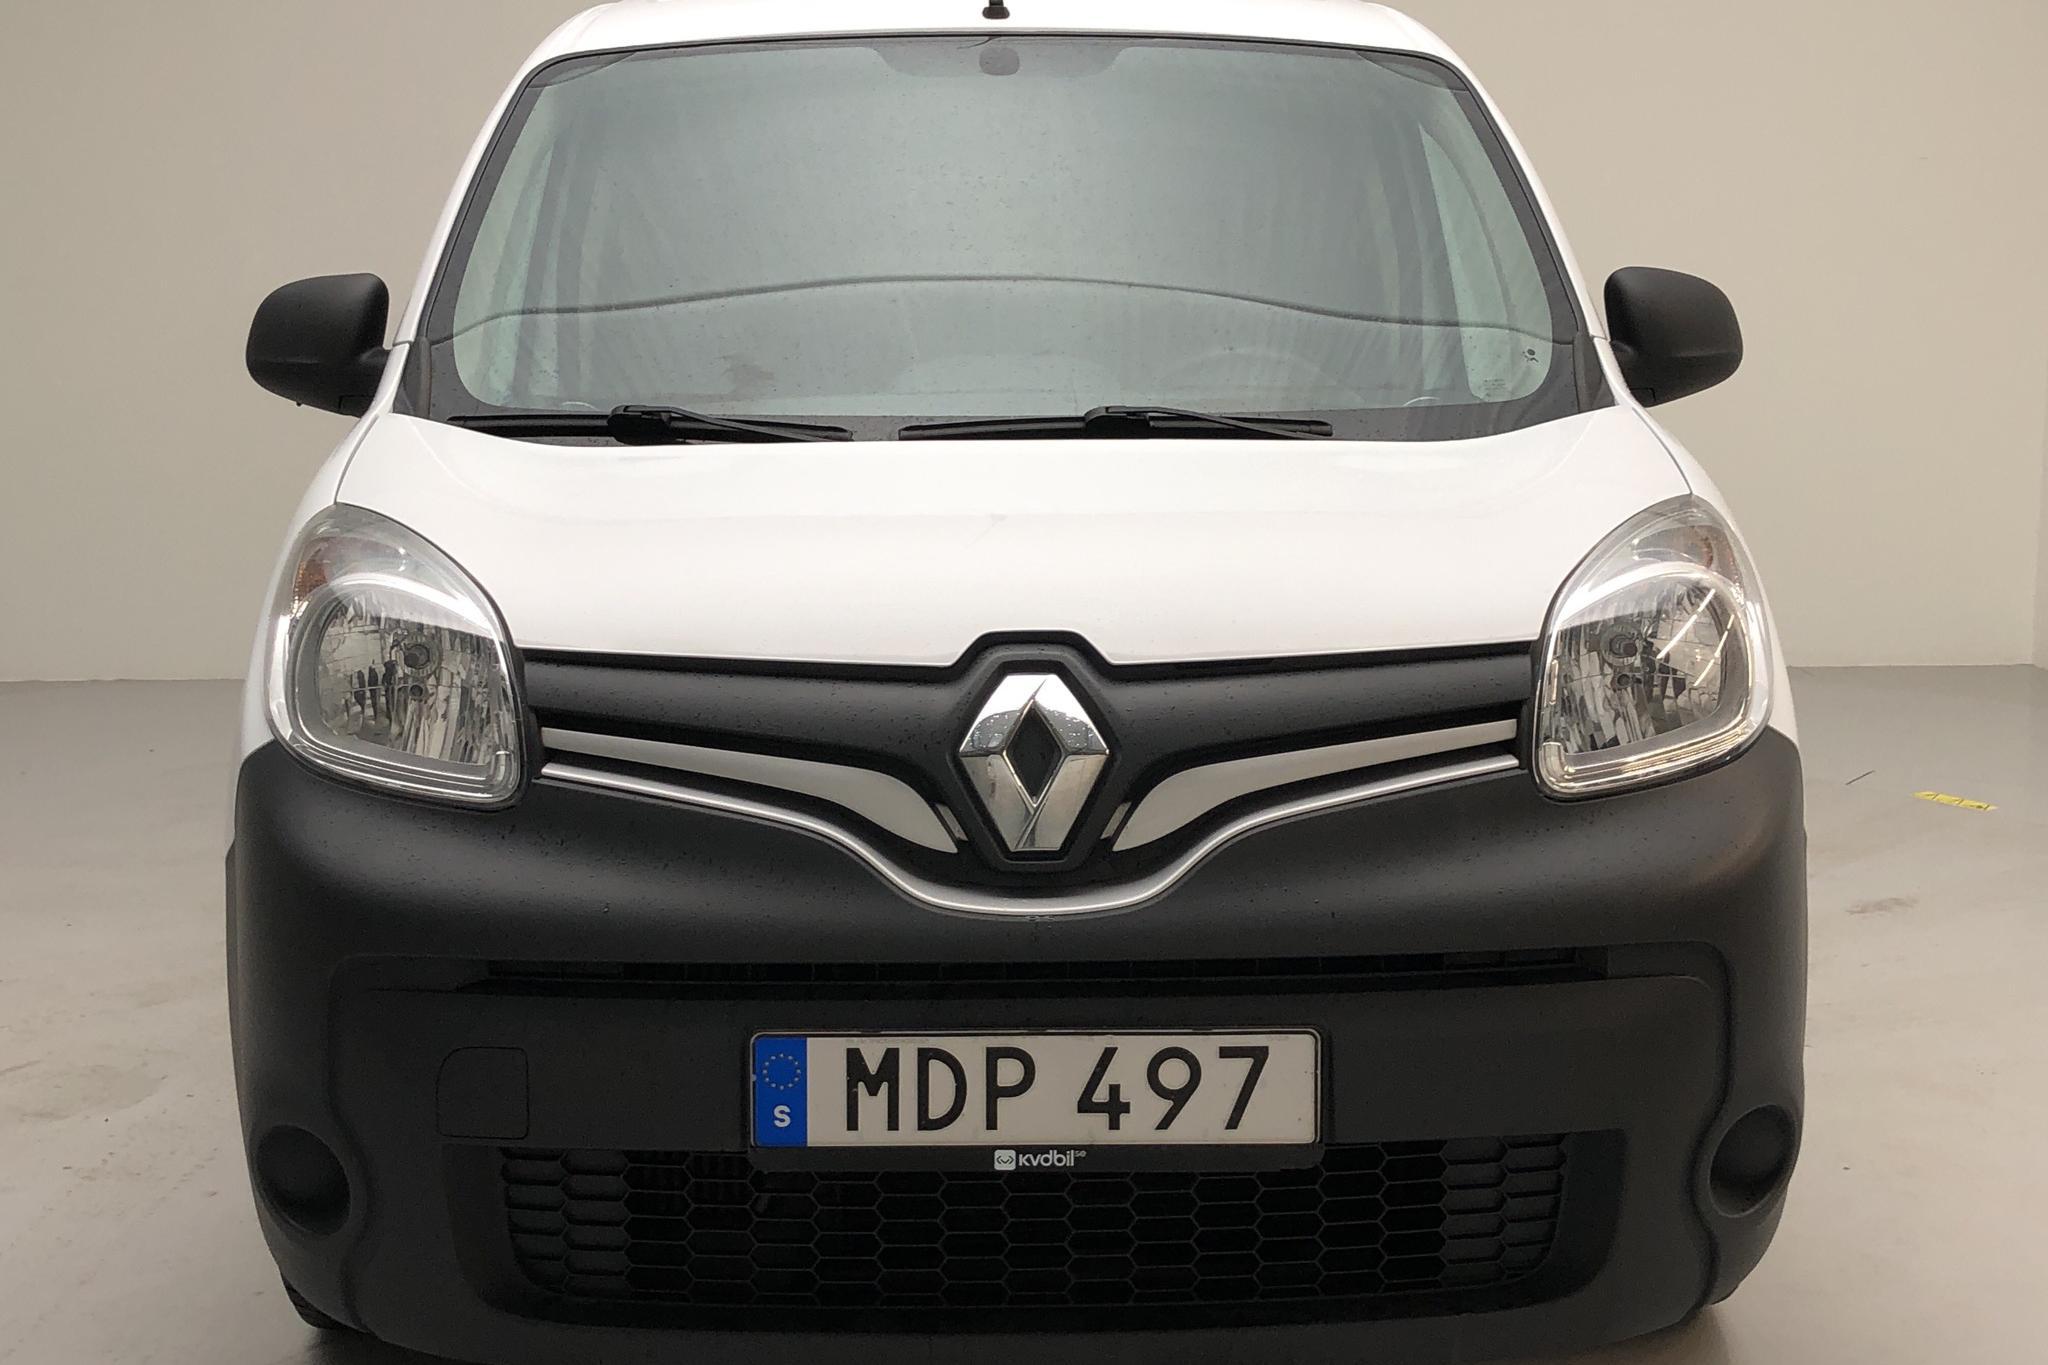 Renault Kangoo 1.5 dCi Maxi Skåp (110hk) - 7 206 mil - Manuell - vit - 2016